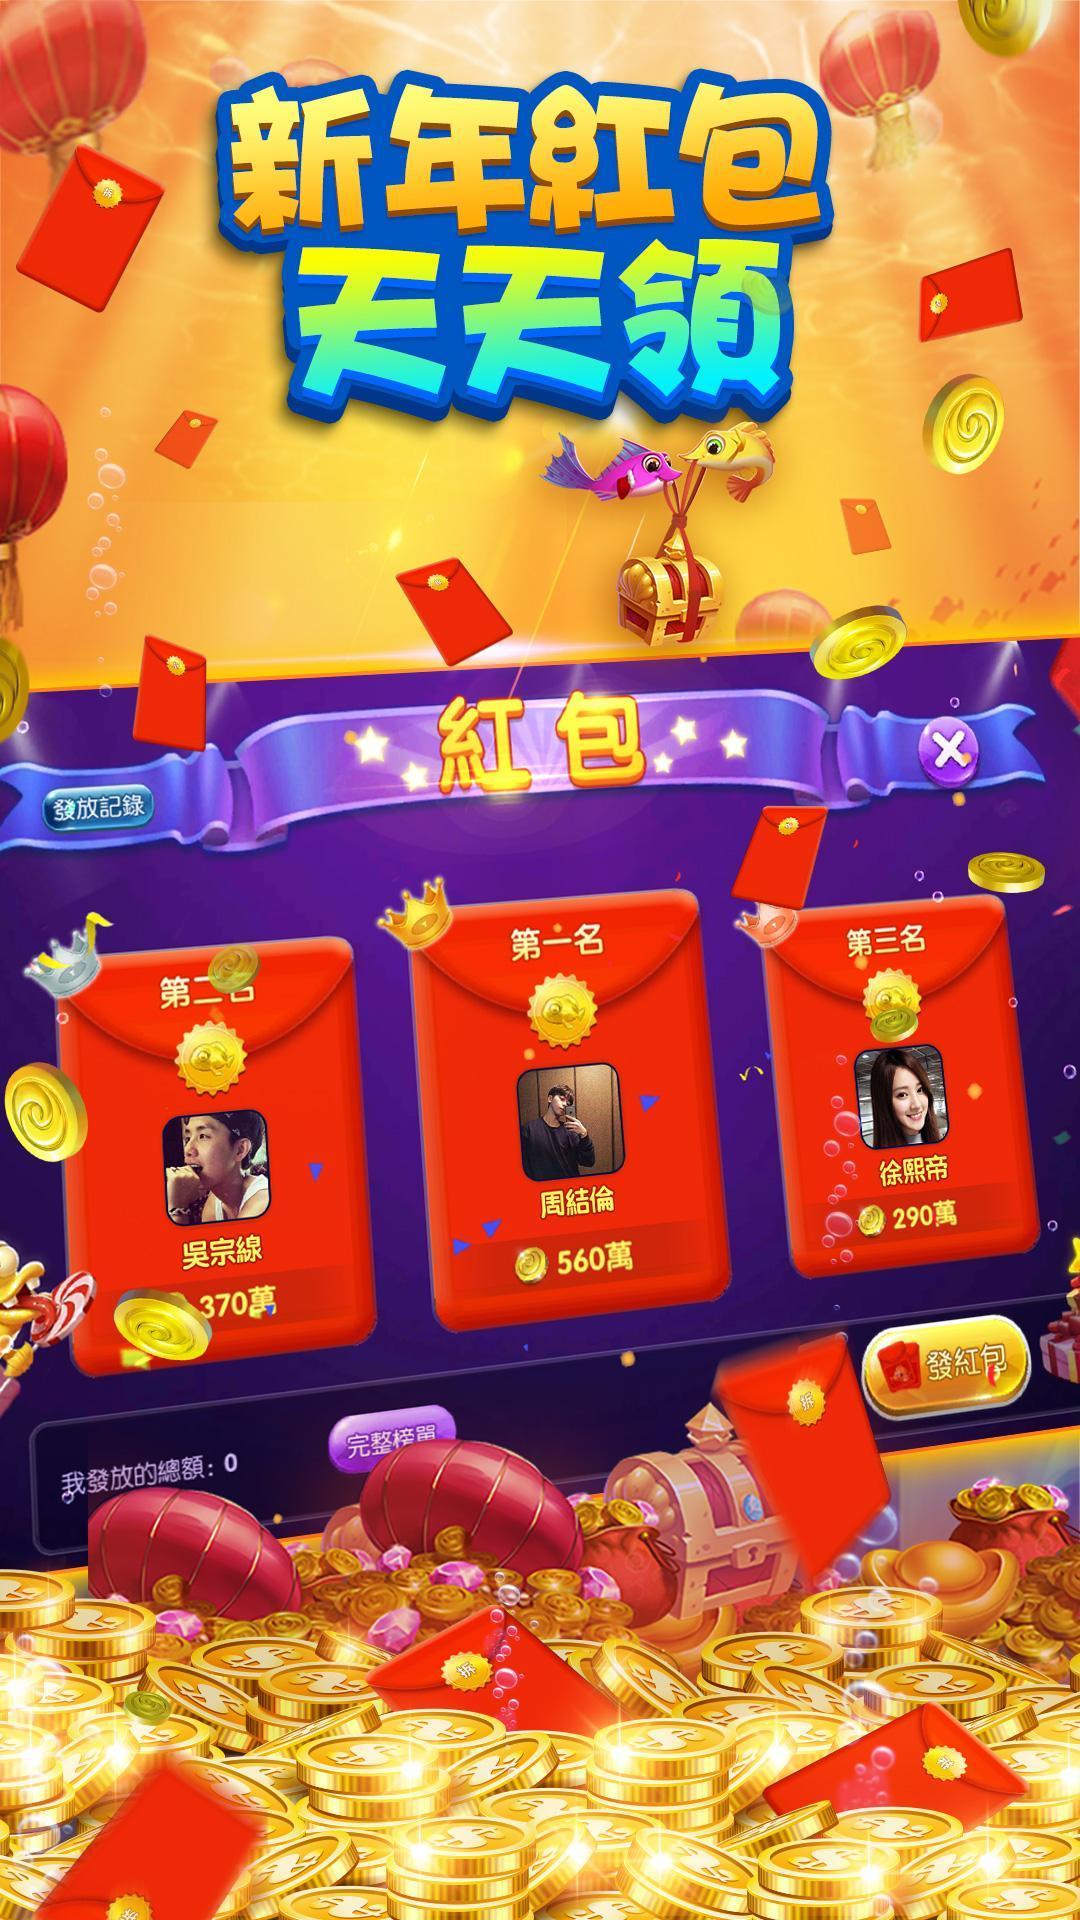 Fish is Coming: Best 3D Arcade 1.16.2 Screenshot 6